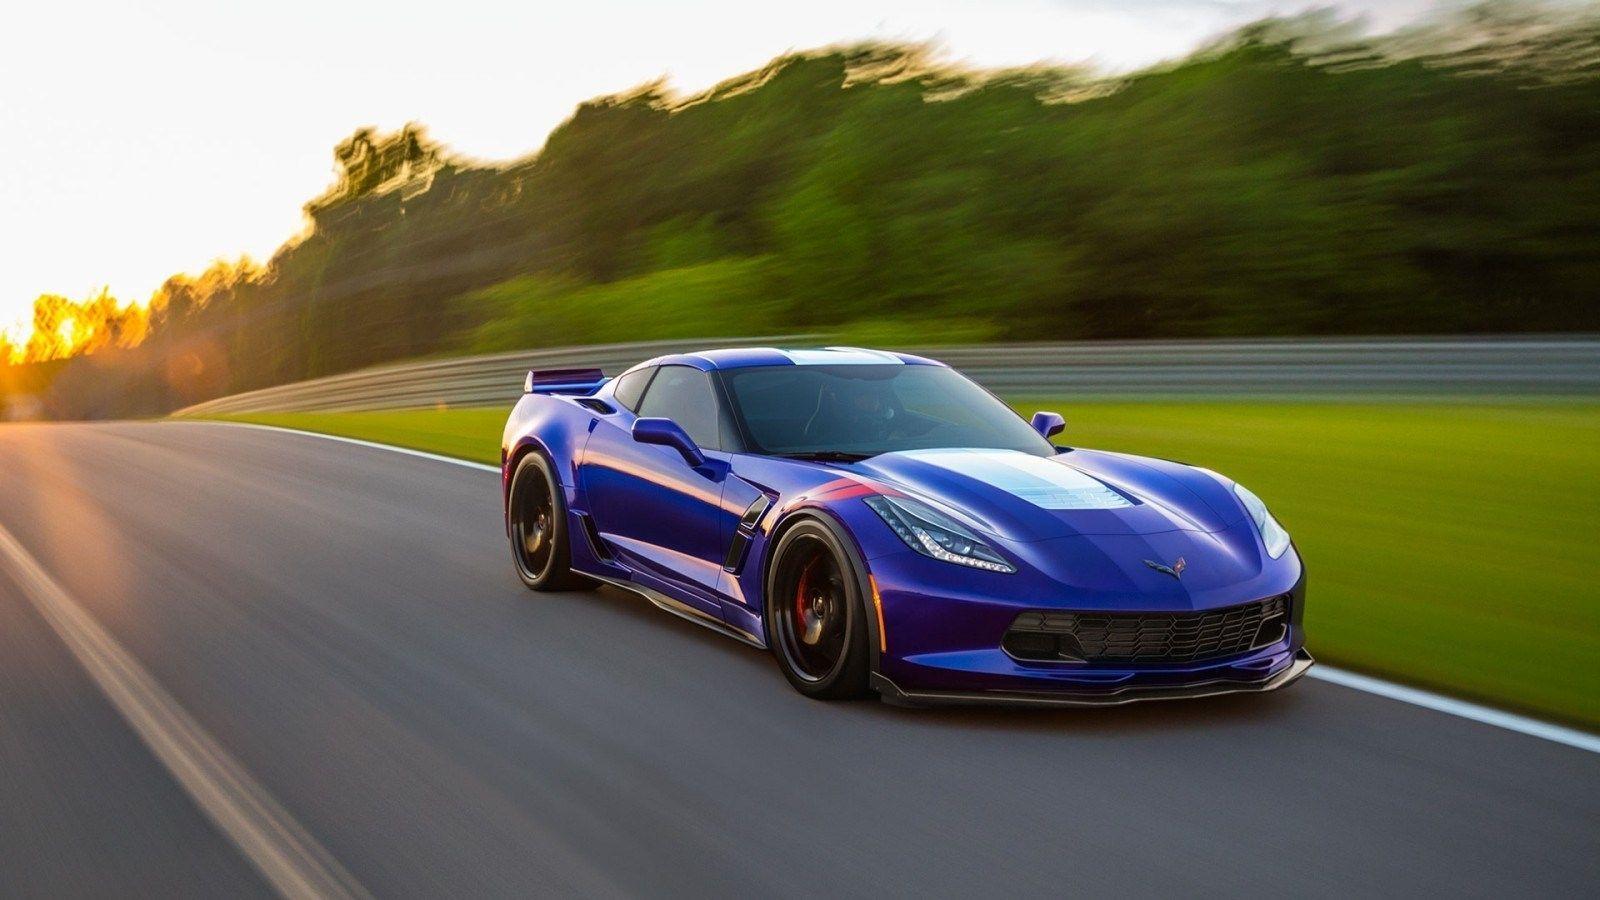 "1280x1024 Chevrolet Corvette C7 755 hp ZR1 Coupe and Convertible 2019"">"